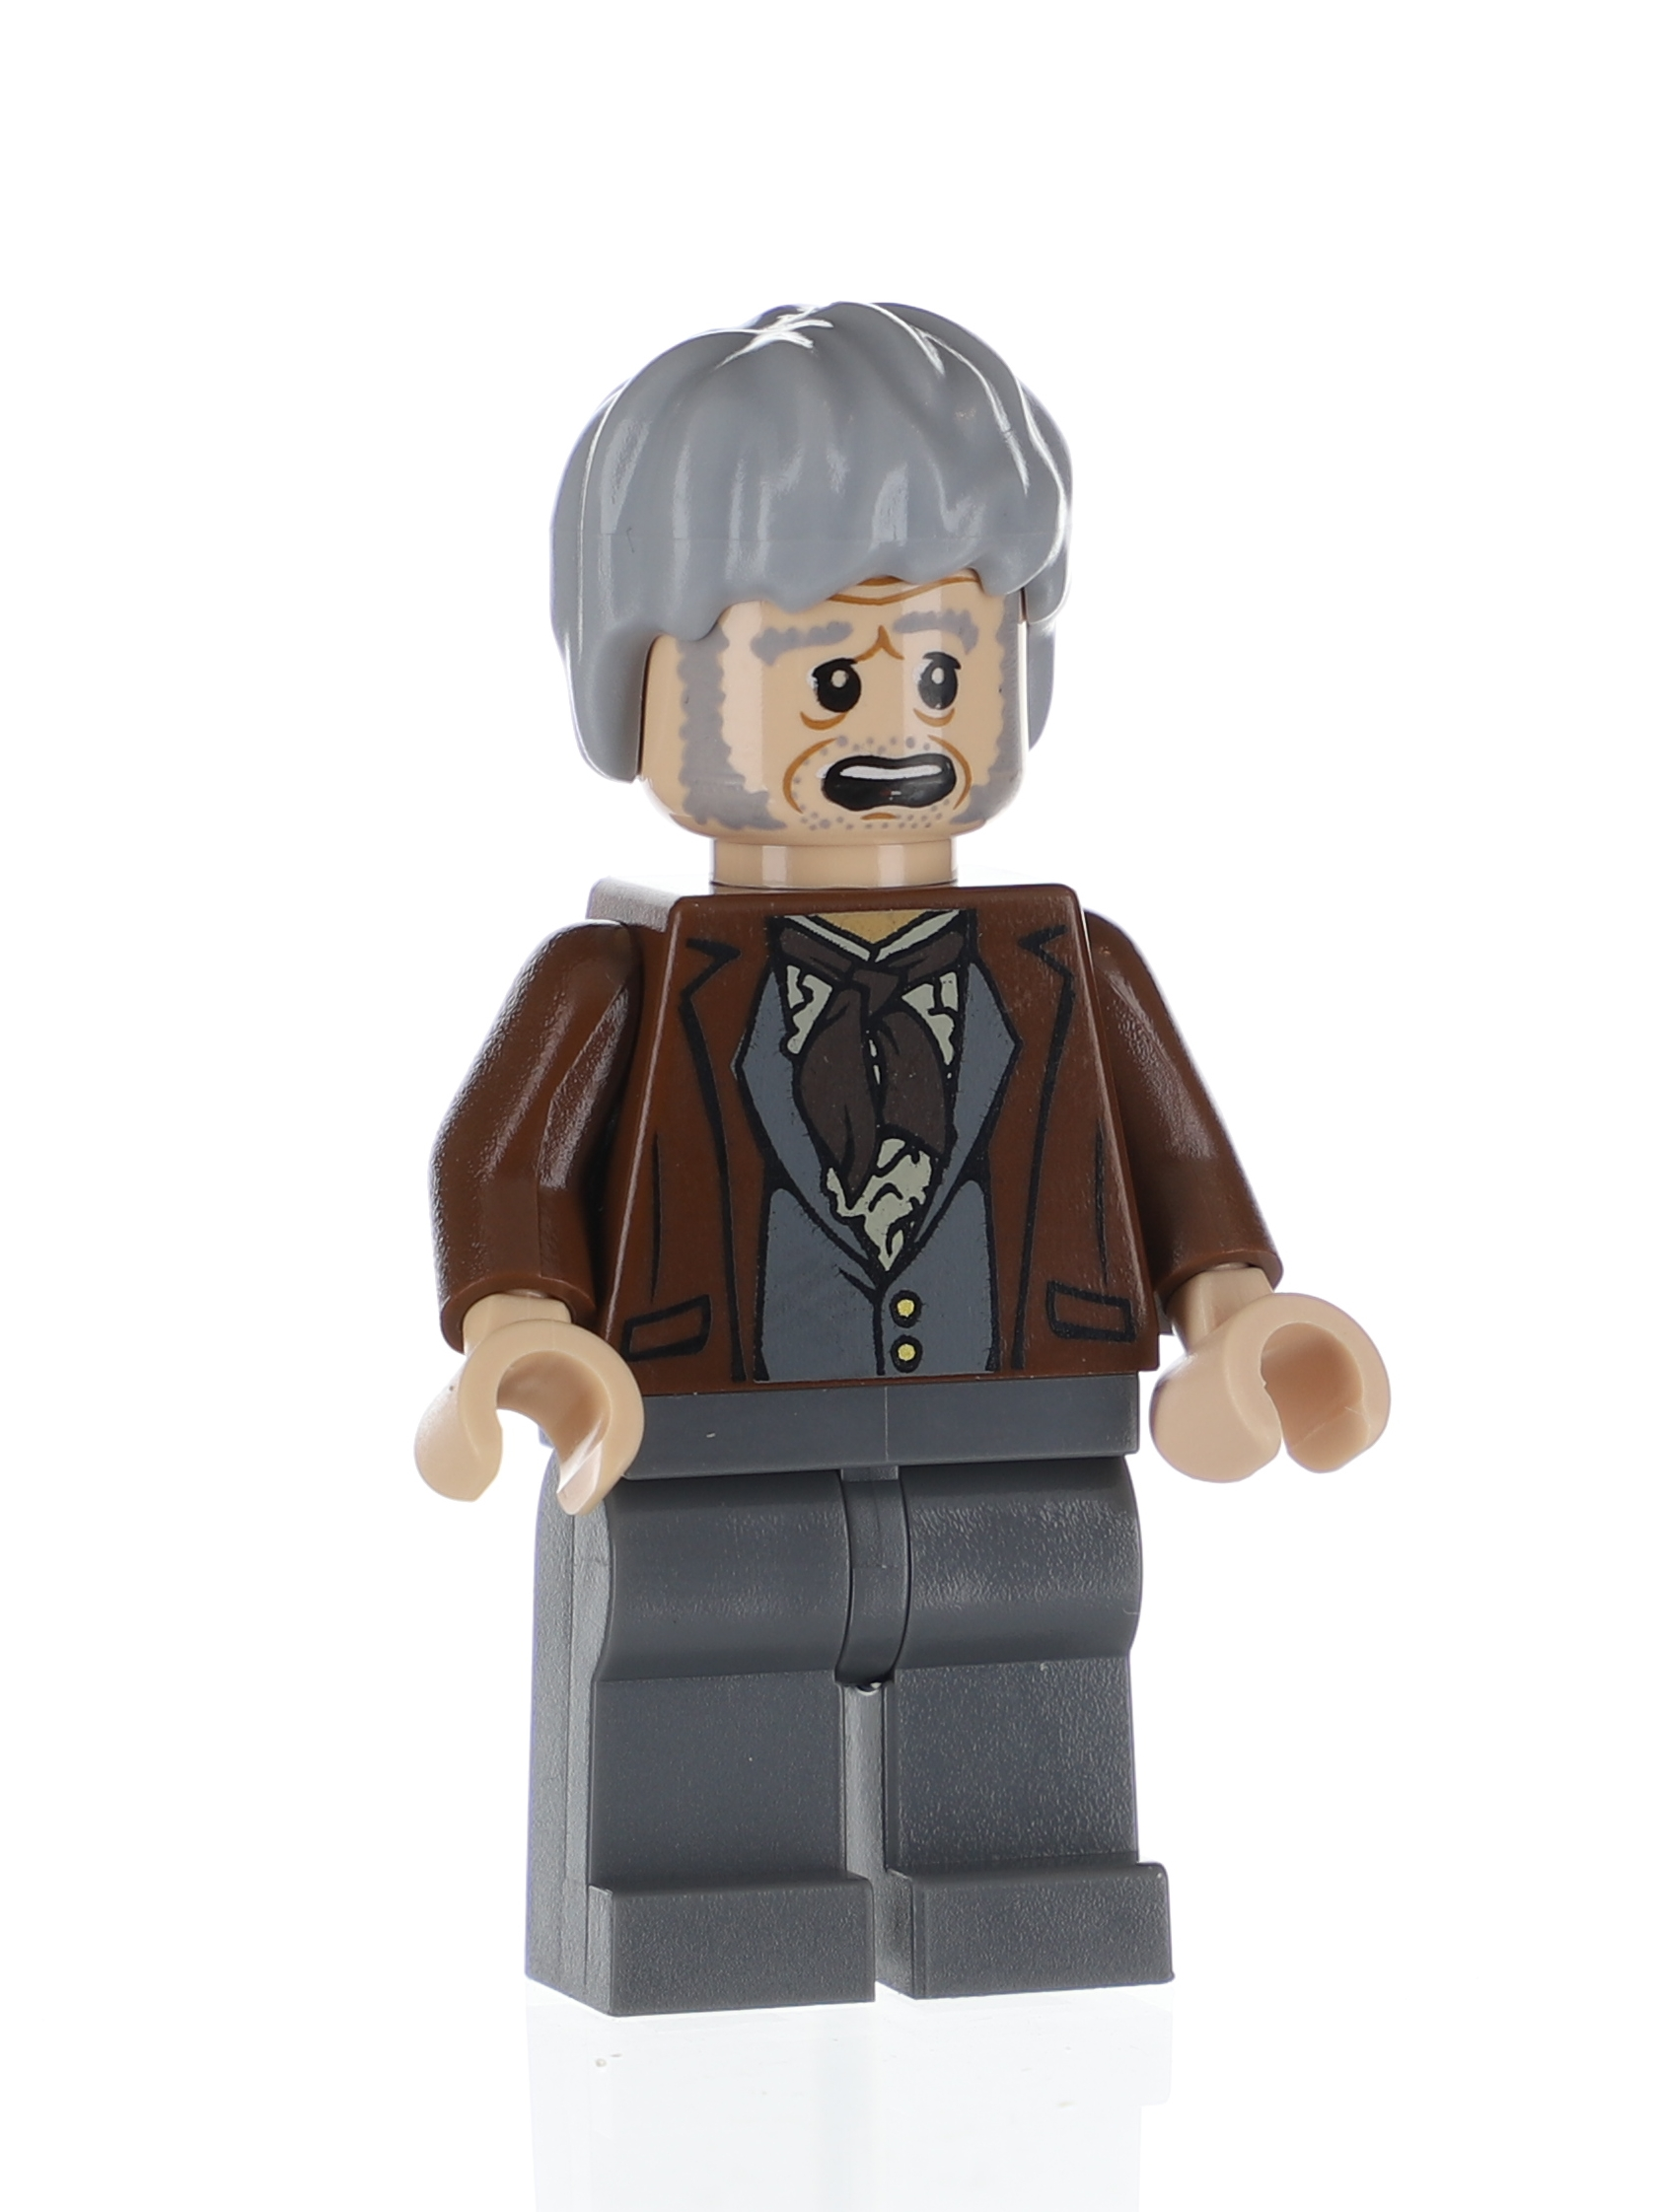 NEW LEGO OLLIVANDER MINIFIGURE 10217 DIAGON ALLEY HARRY POTTER